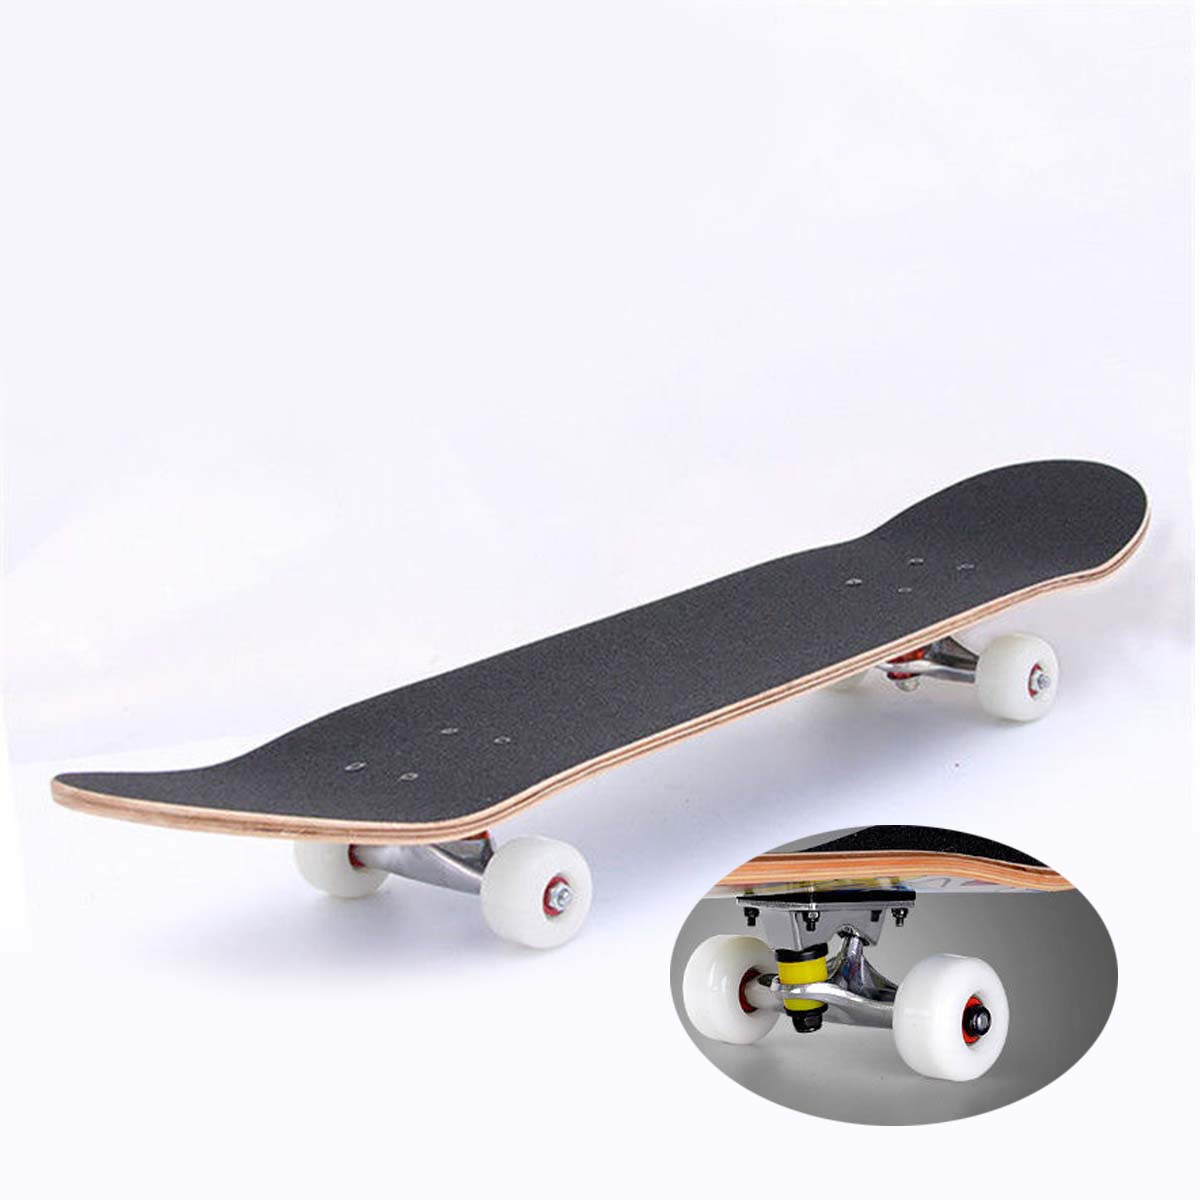 Sport Skateboard Longboard Wheels 83A with ABEC-9 Bearings Spacers Yellow Kit